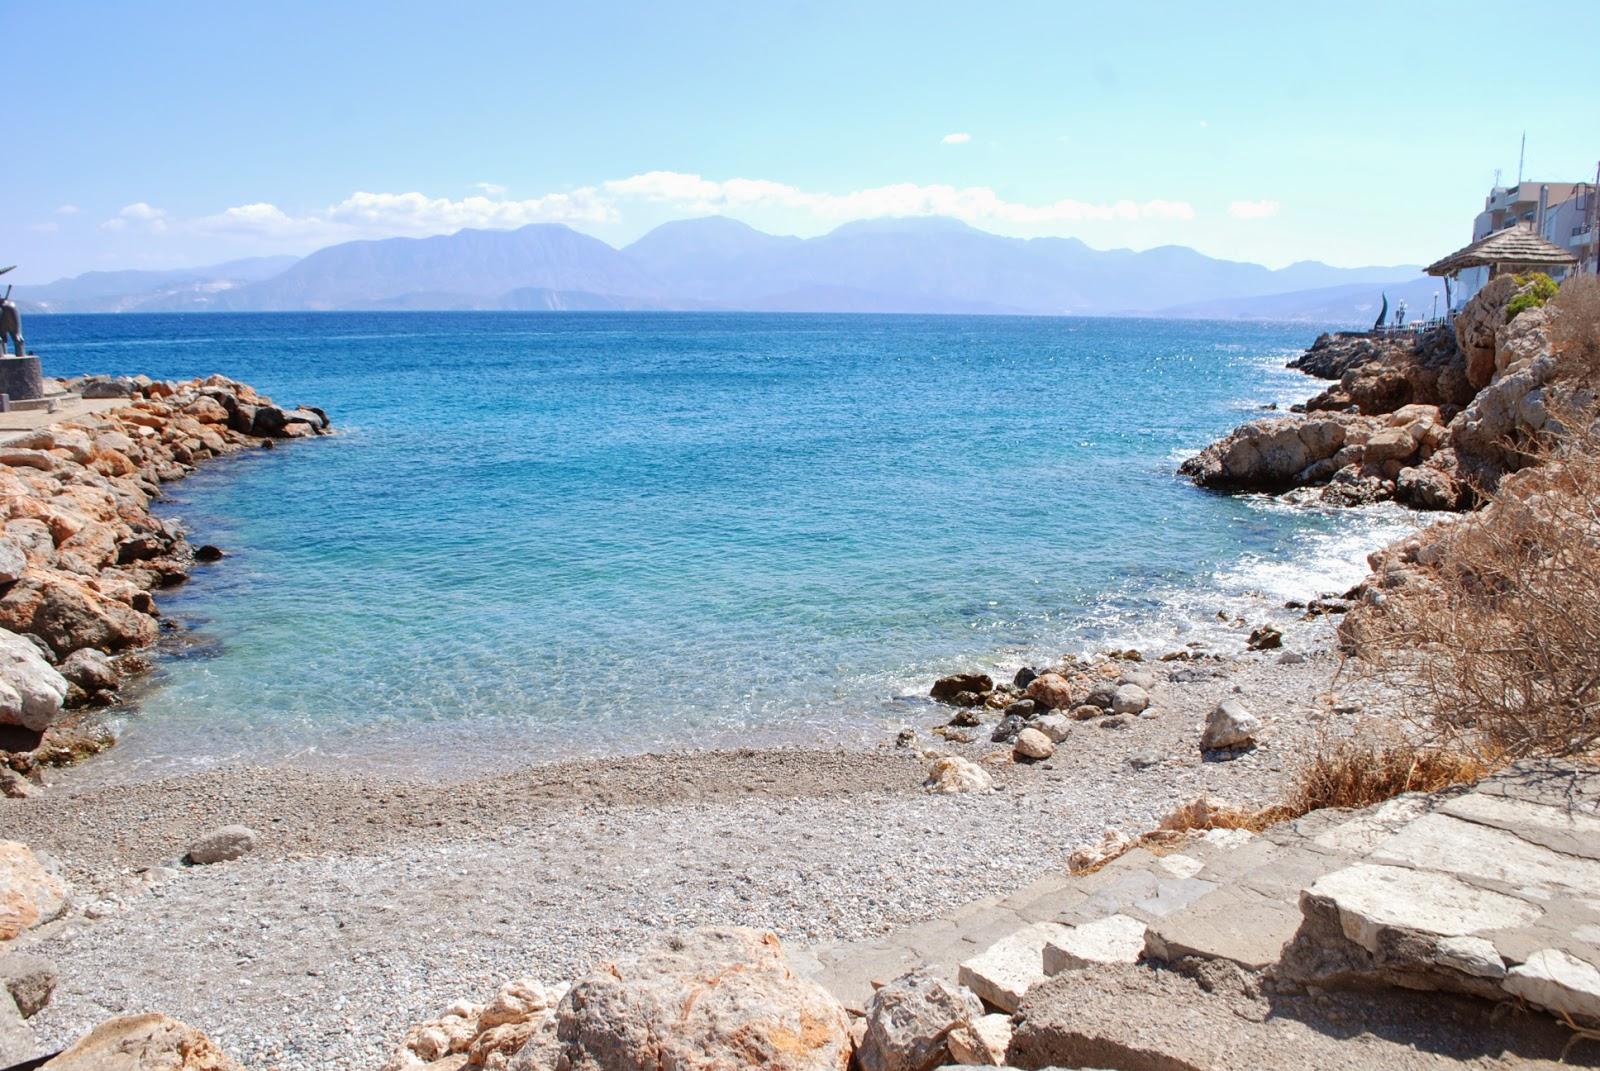 Агиос-Николаос, Крит, Греция. Agios Nikolaos, Crete, Greece.